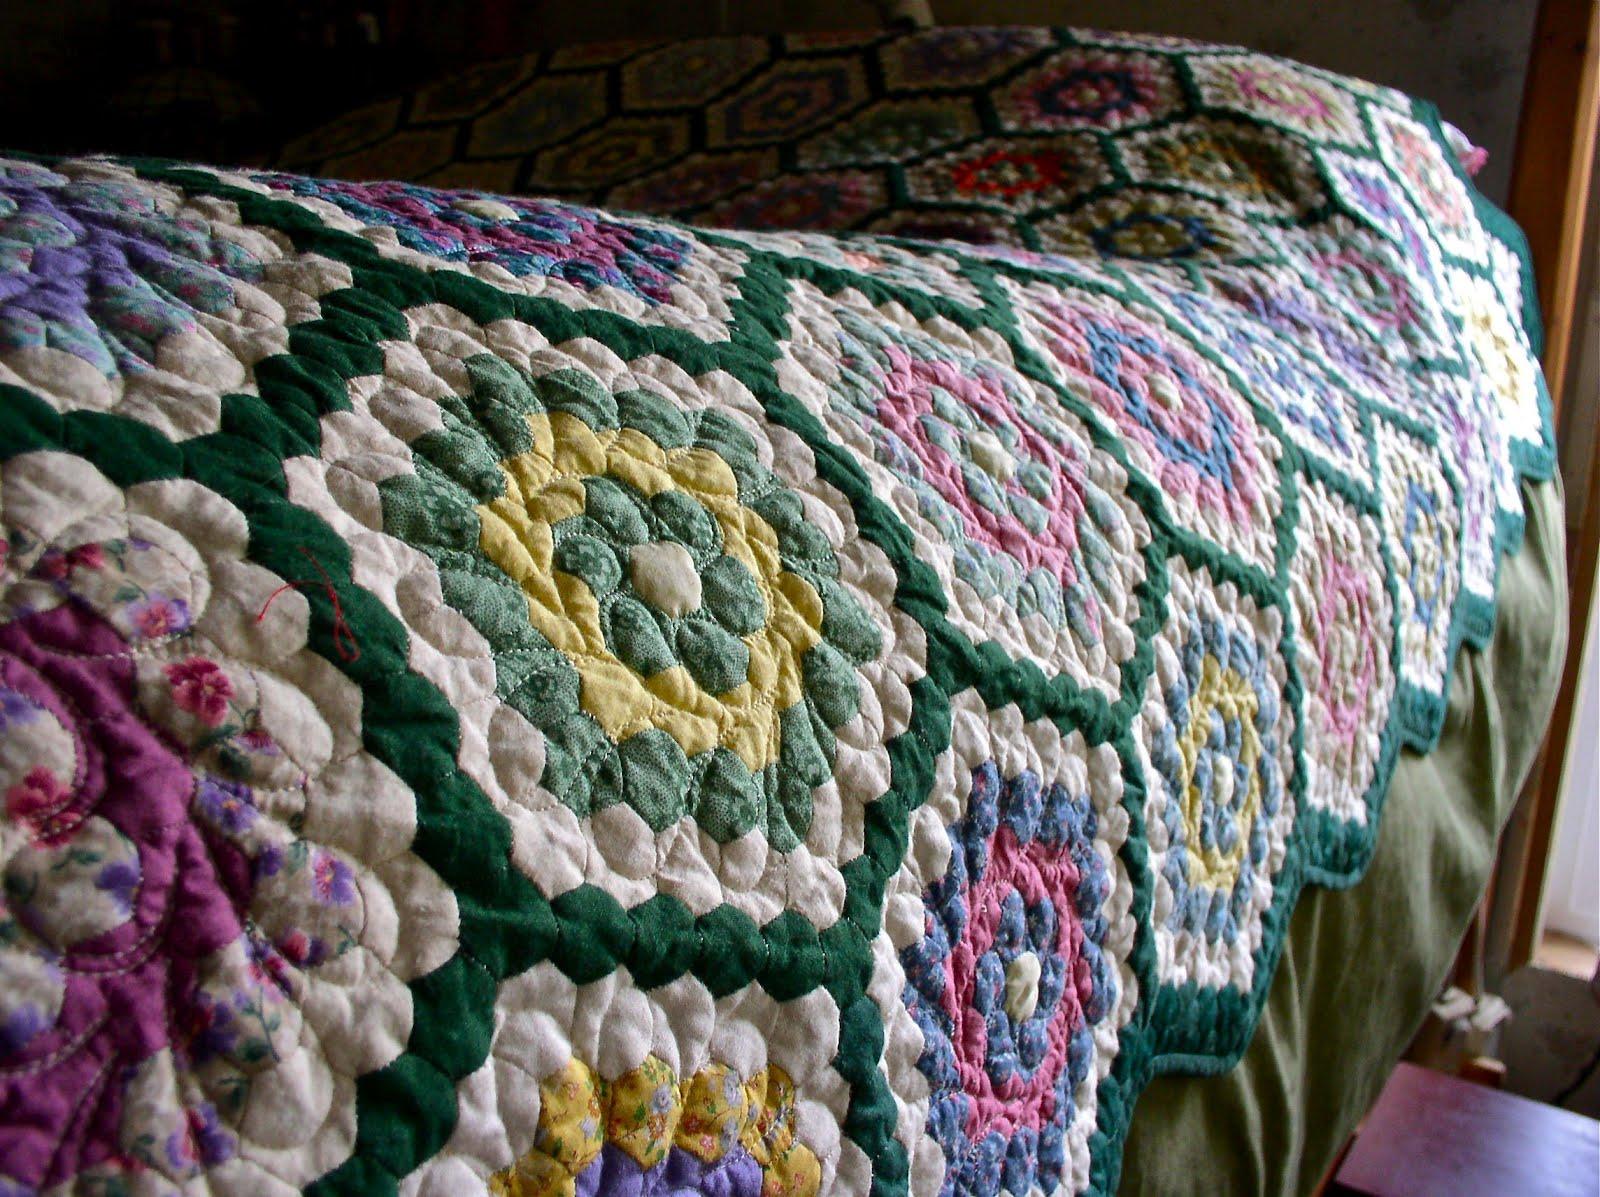 Luann kessi grandmothers flower garden on the bed - Grandmother s flower garden quilt ...